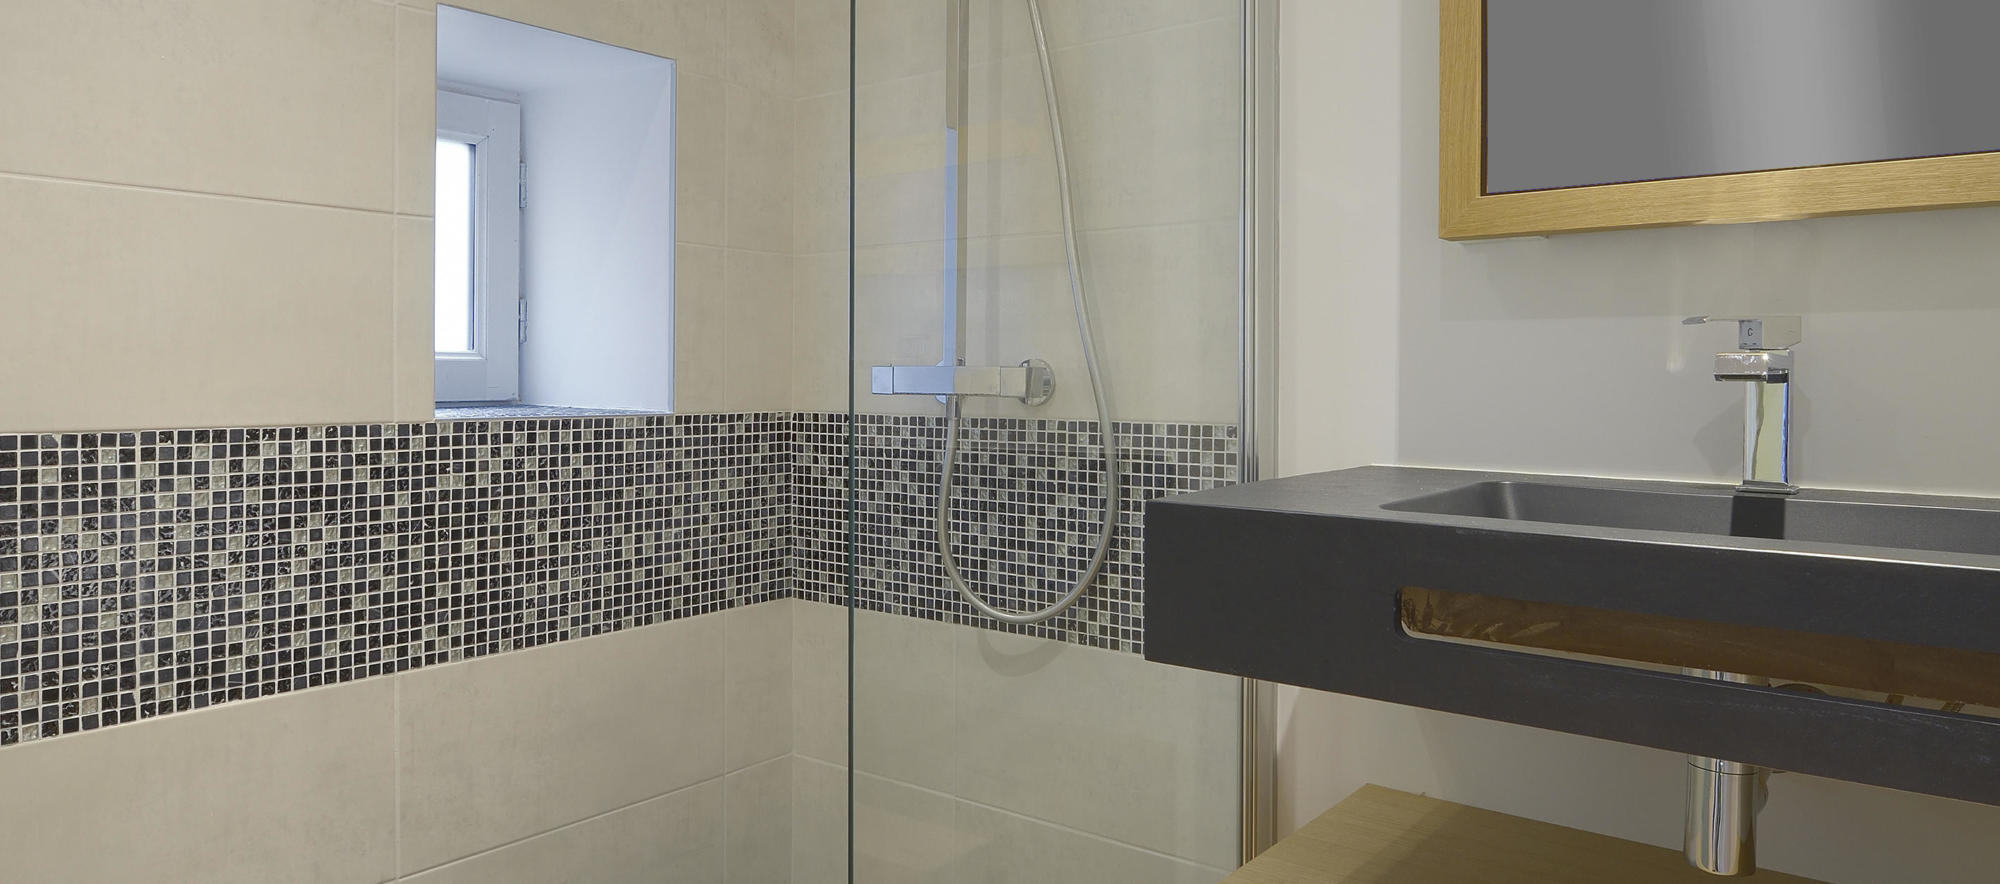 salle de bain angers. Black Bedroom Furniture Sets. Home Design Ideas